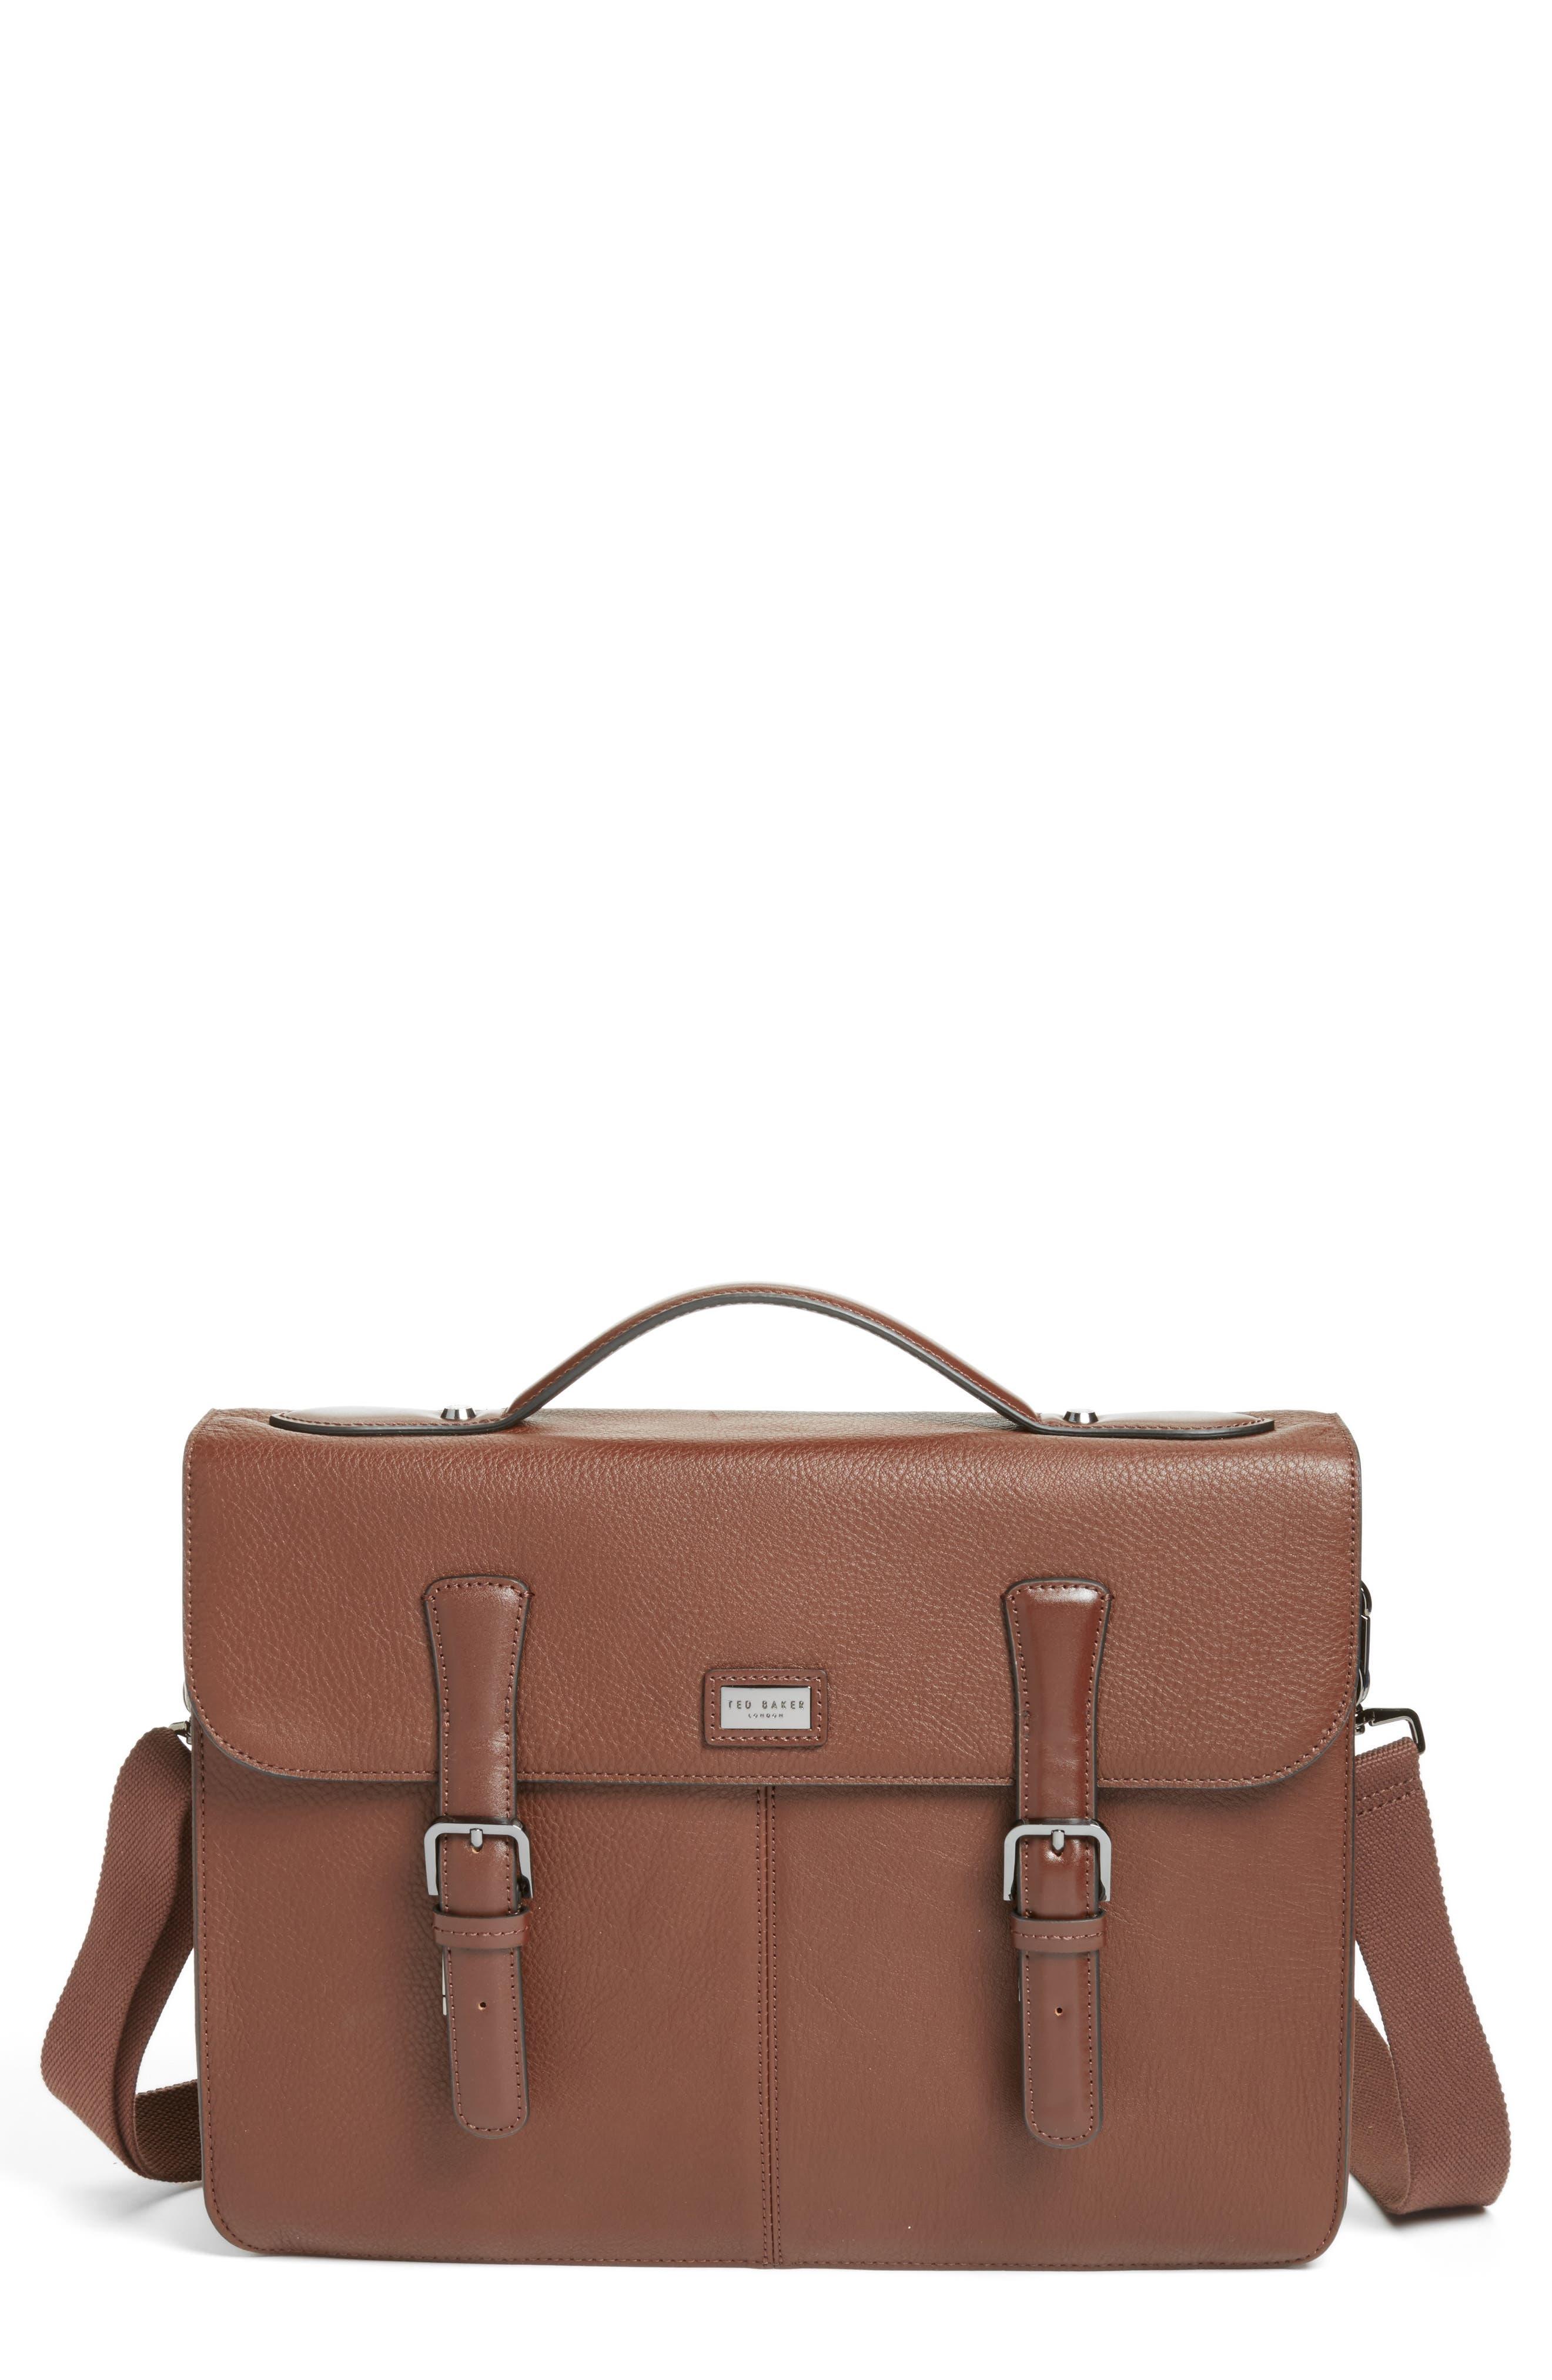 Bengal Leather Satchel,                             Main thumbnail 2, color,